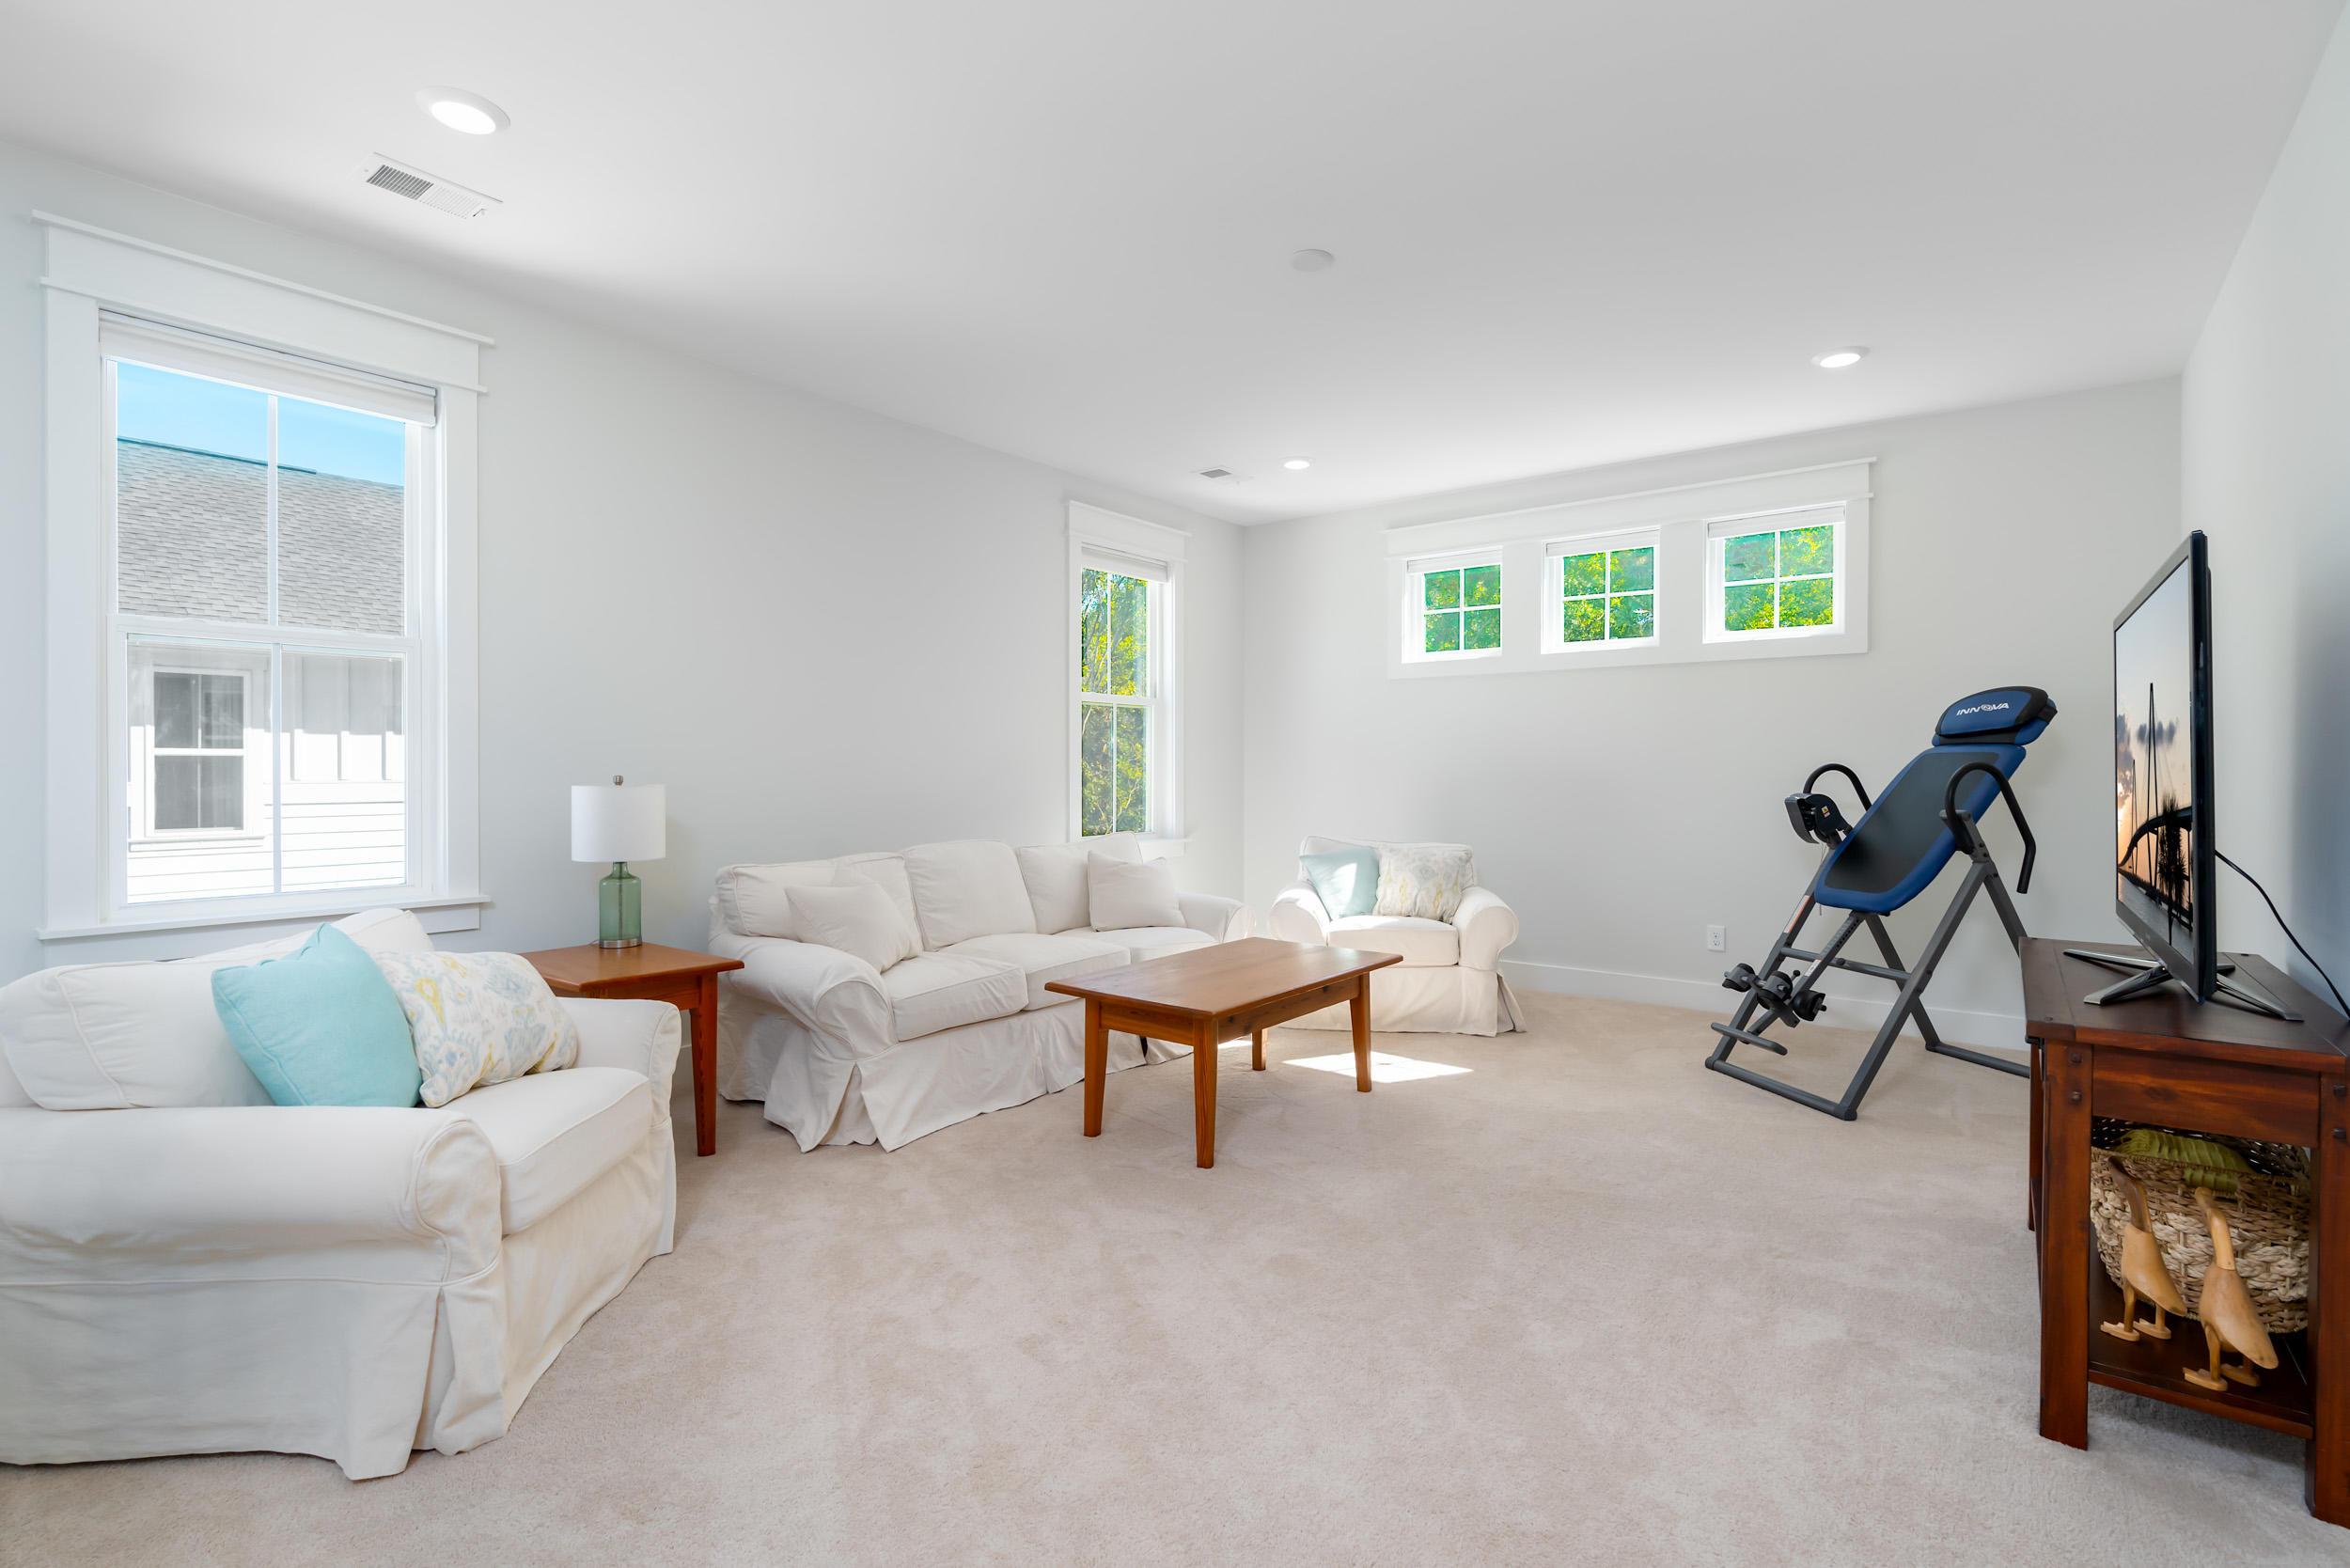 Hamlin Oaks Homes For Sale - 2921 Tranquility, Mount Pleasant, SC - 28